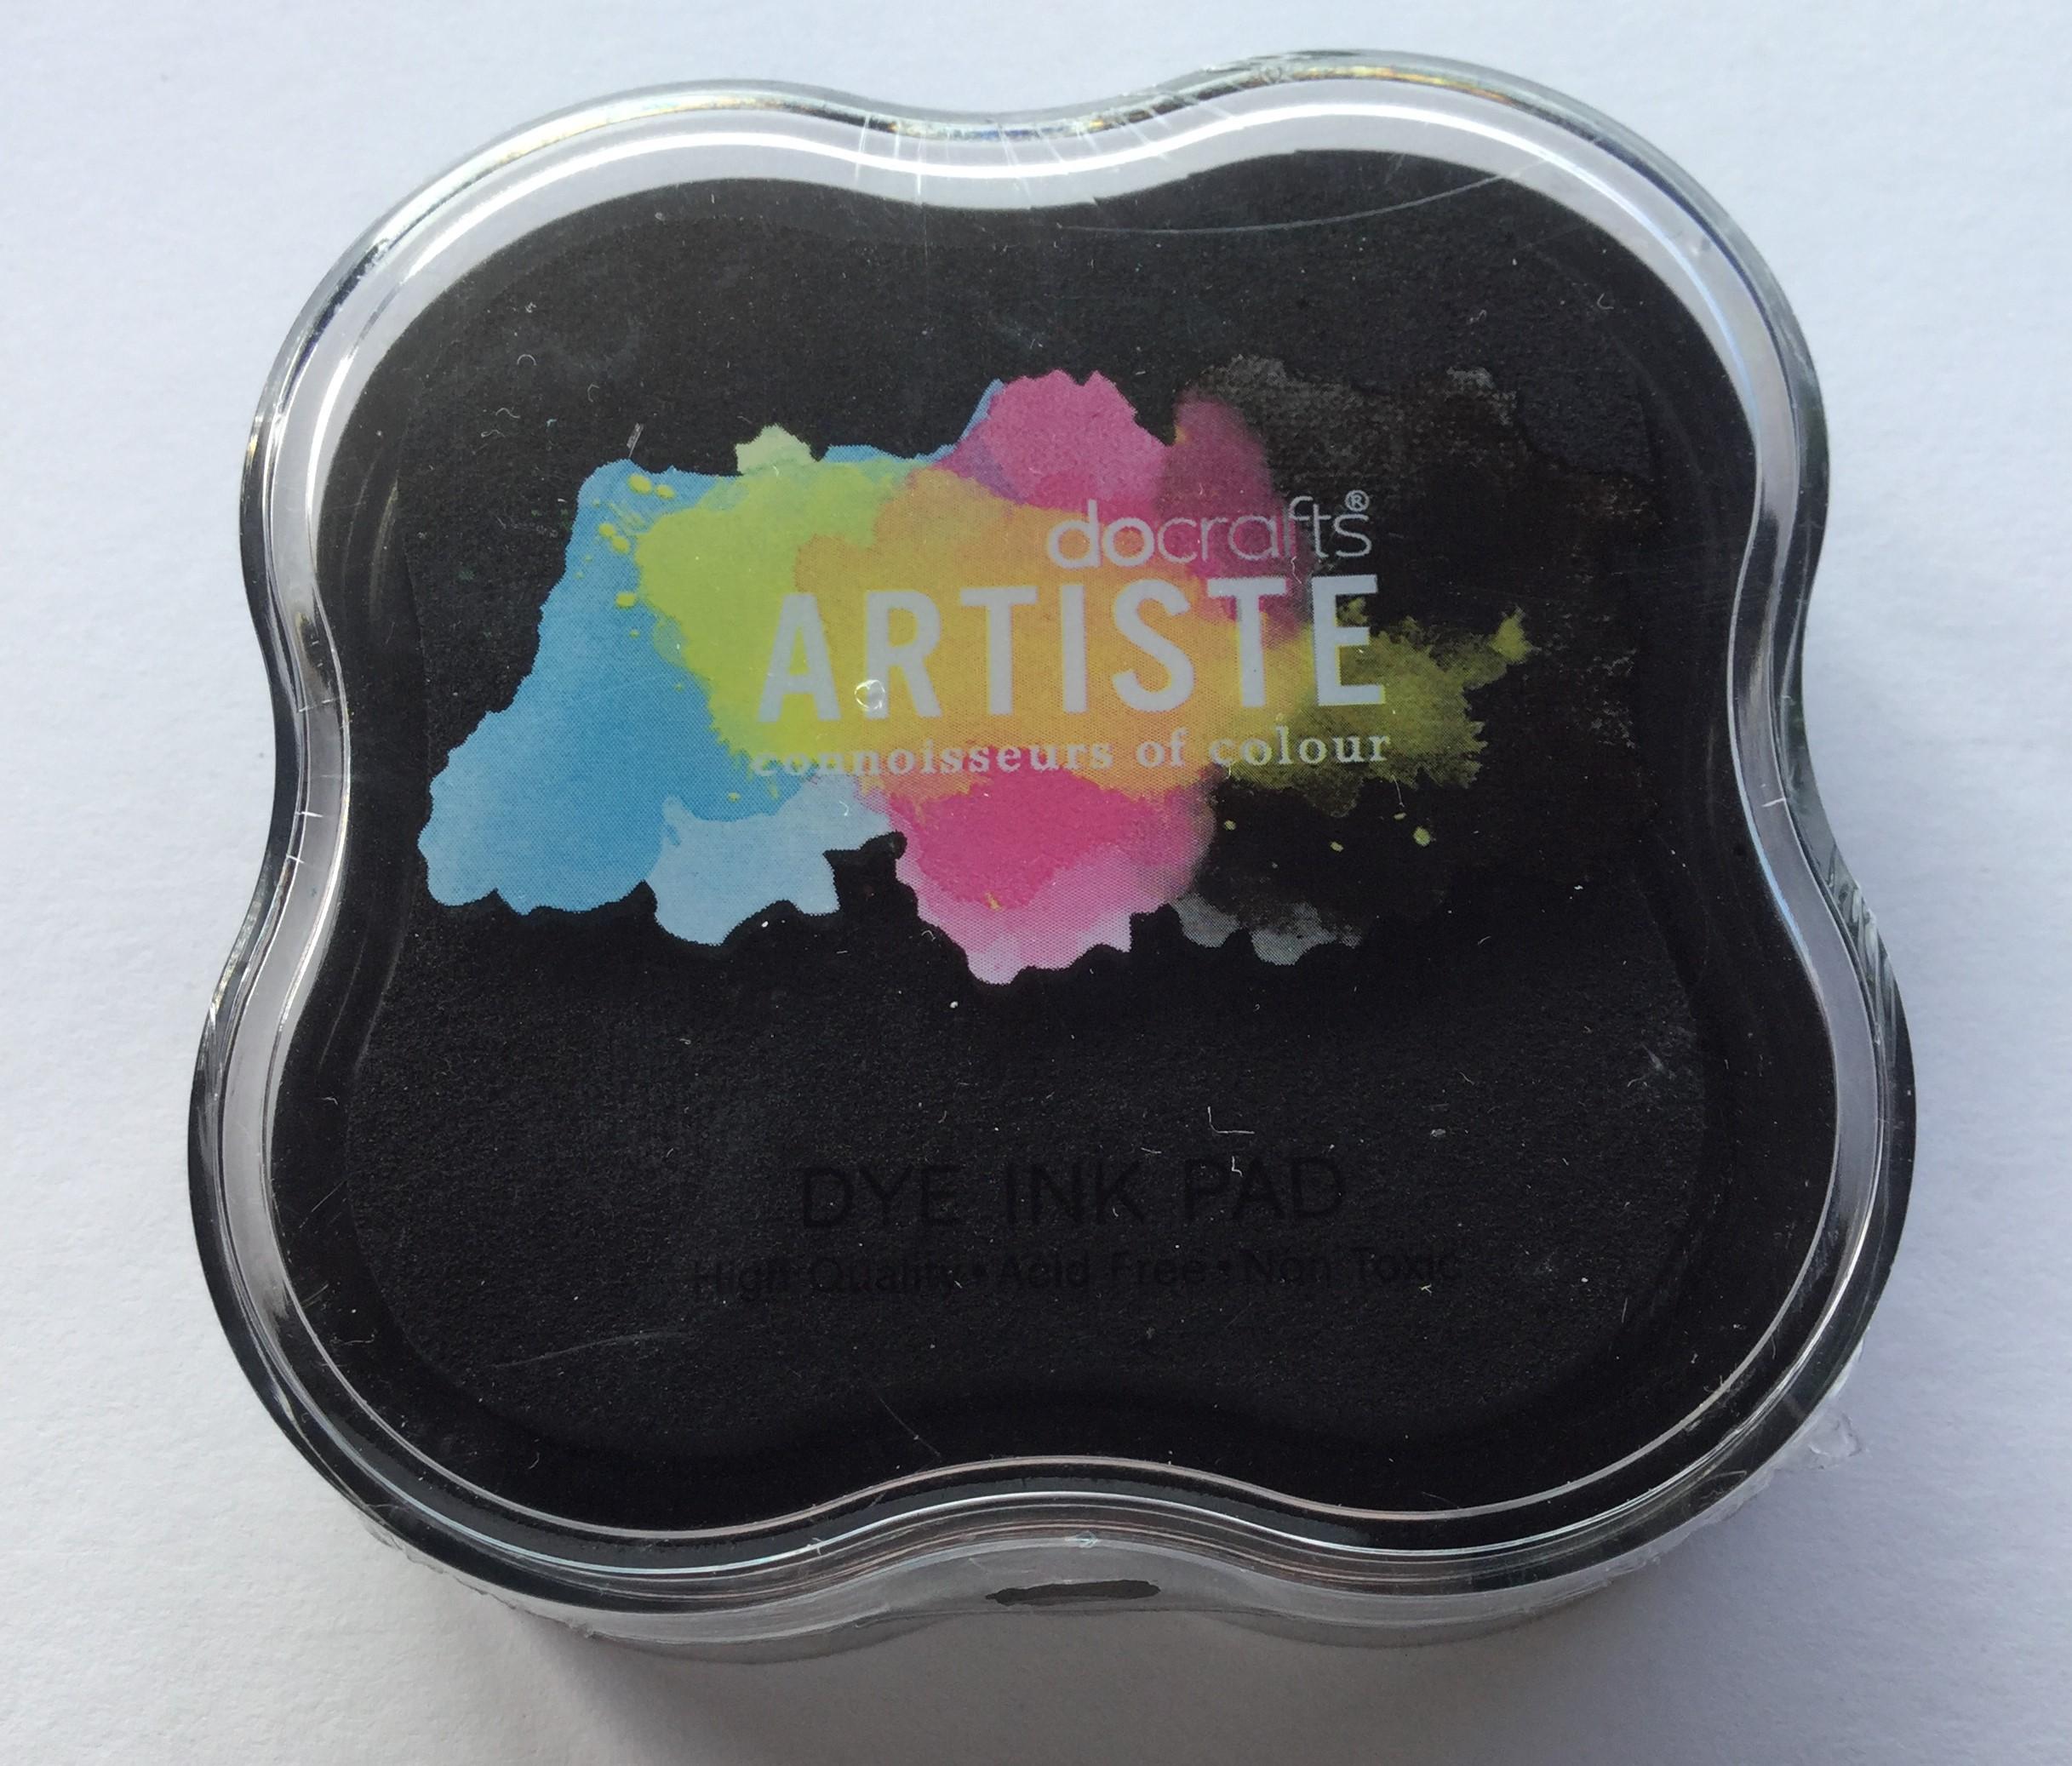 Leimasintyyny, Docrafts Artiste Dye, musta